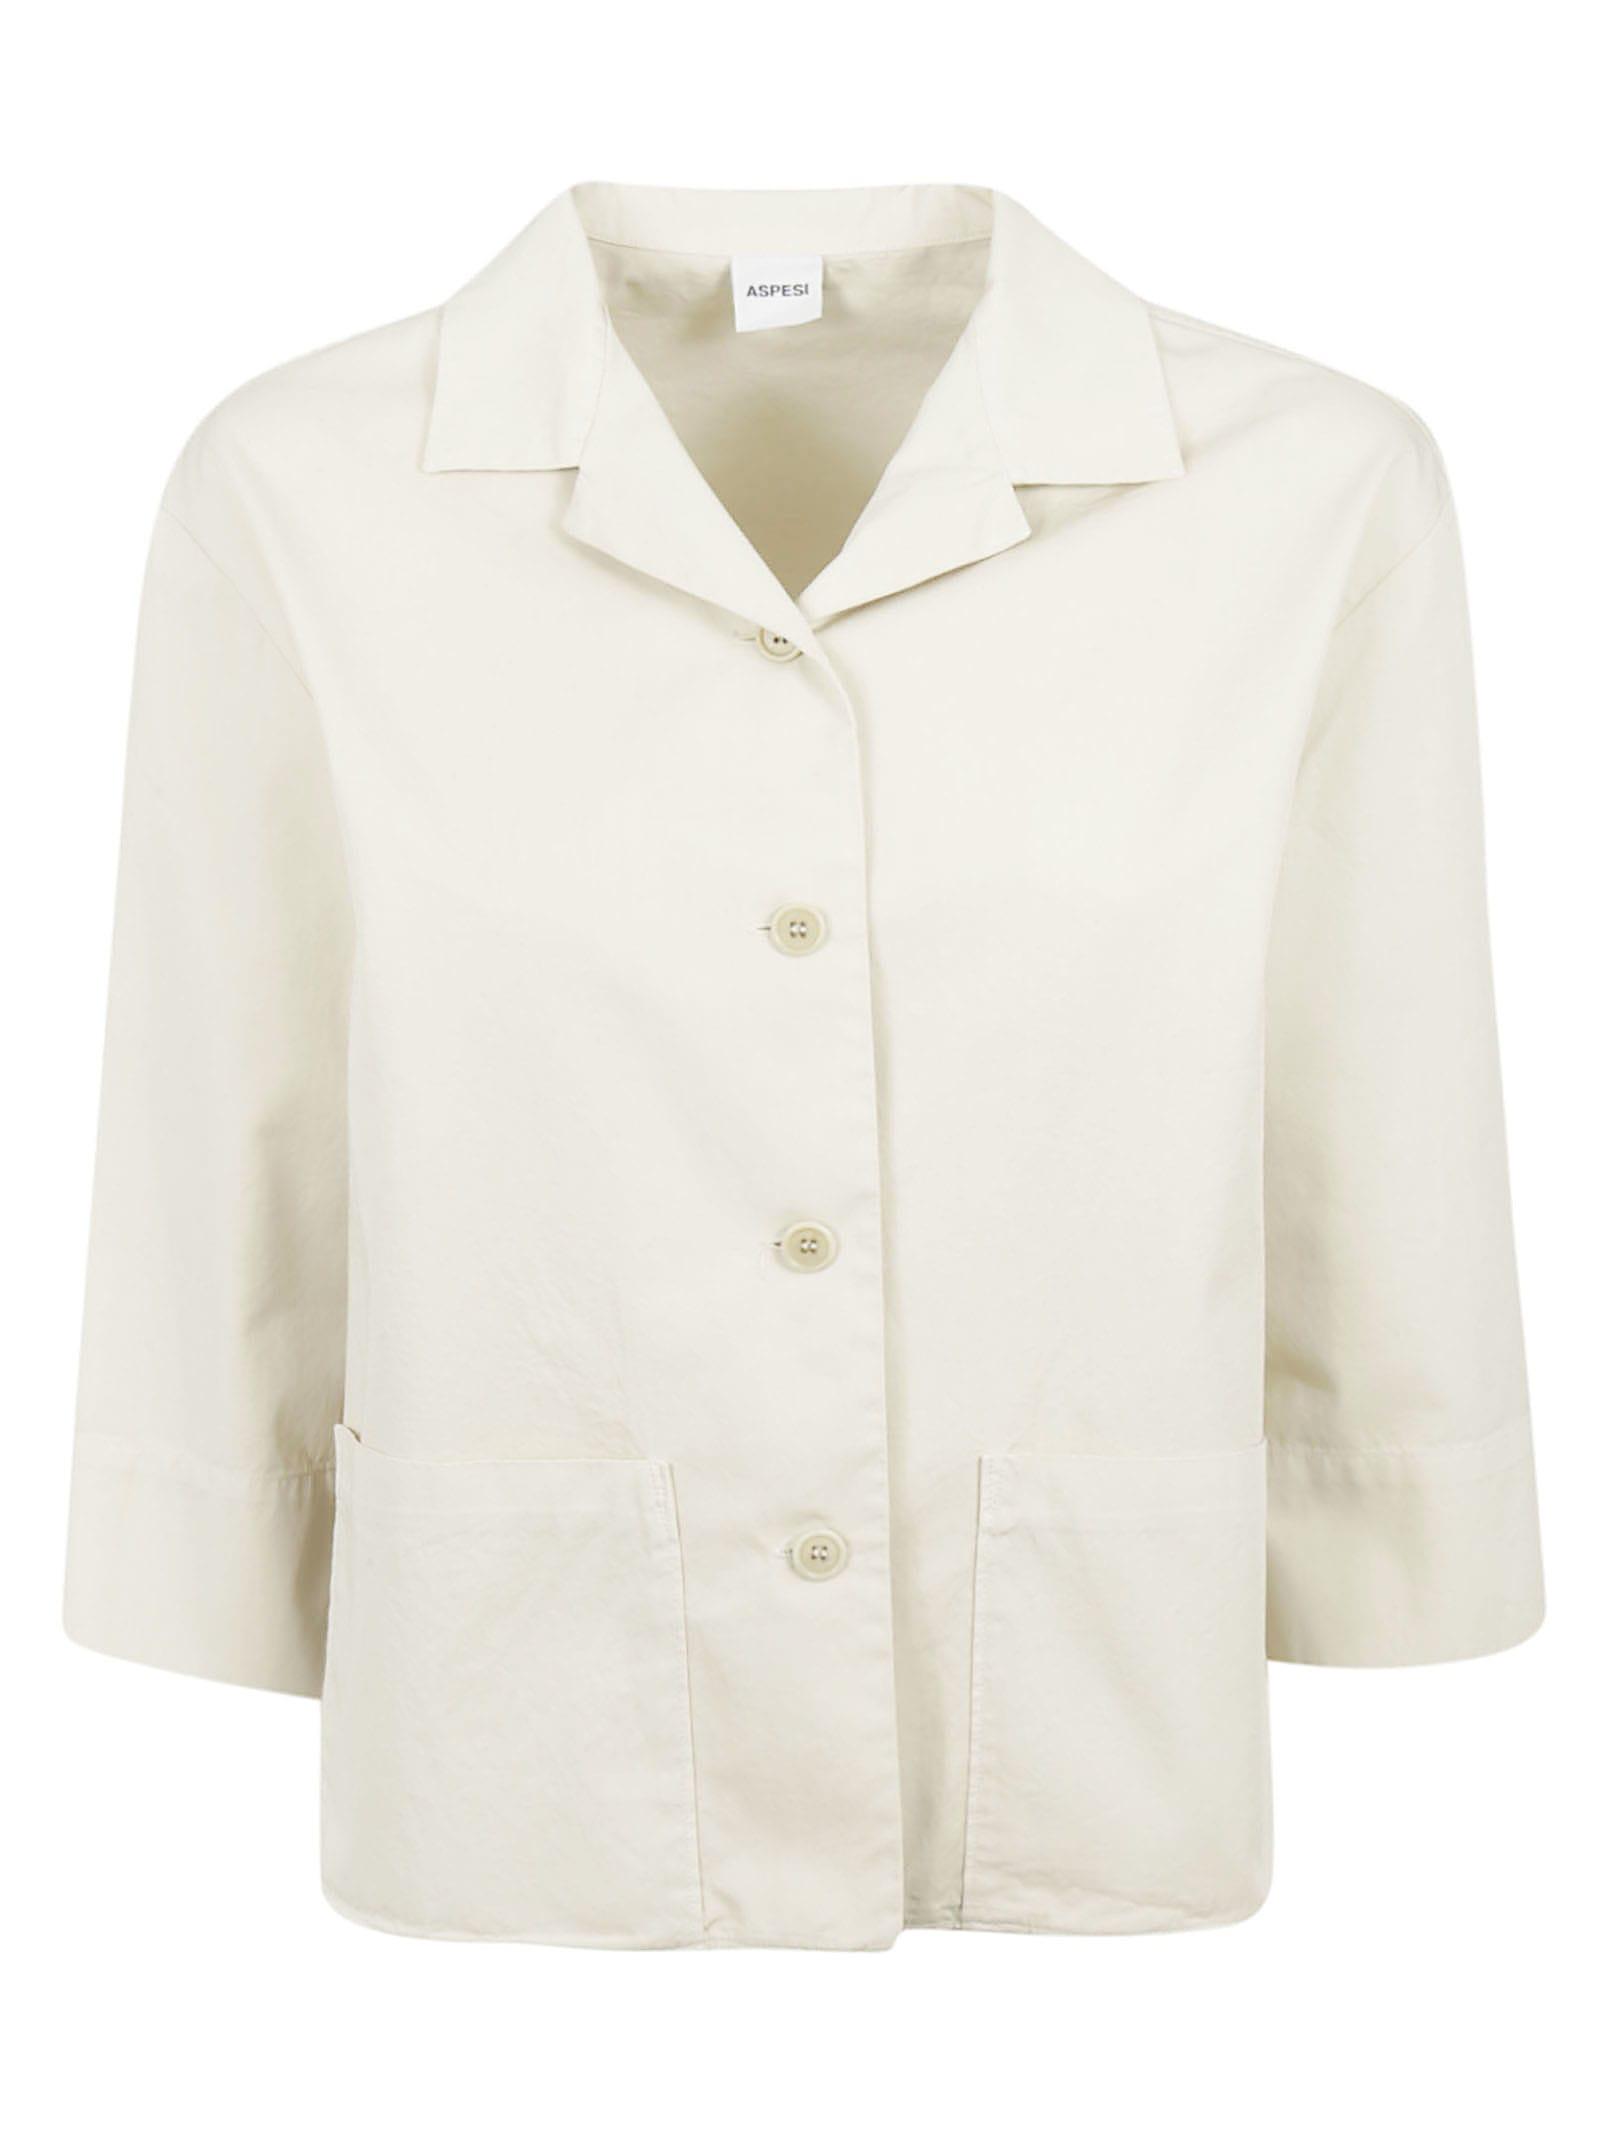 Aspesi Short Sleeved Jacket